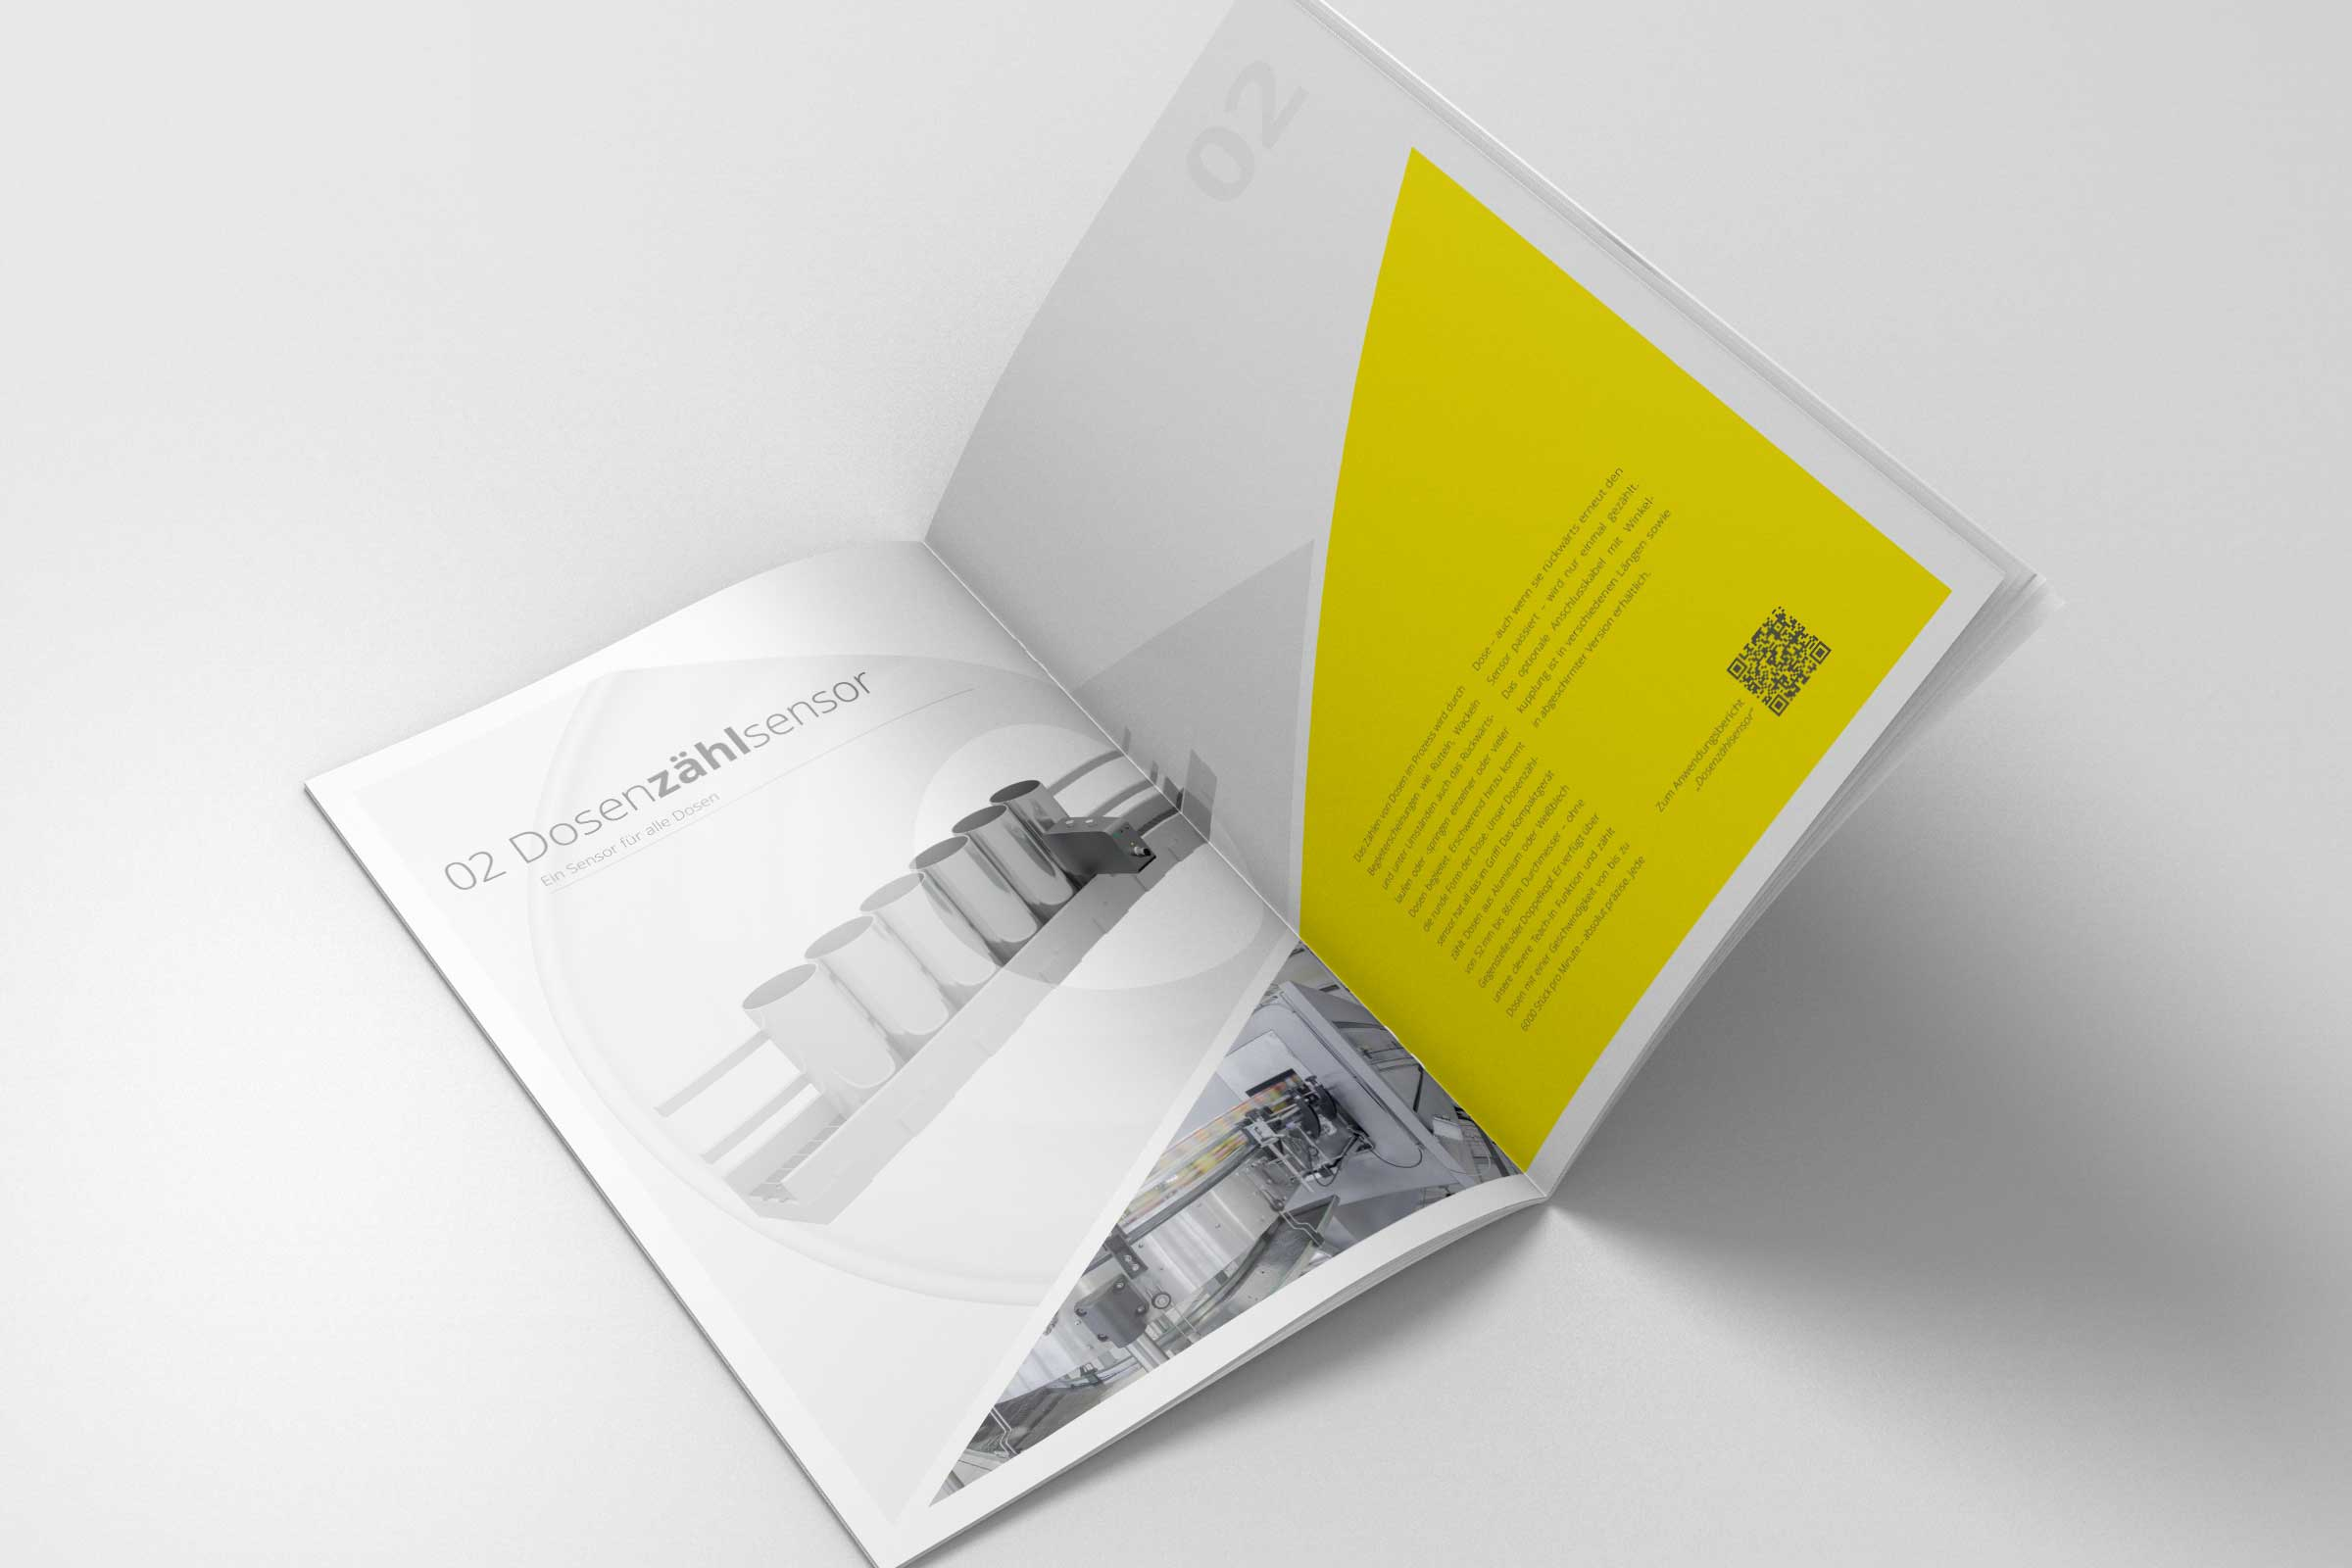 Branchen-Broschüre Proxitron